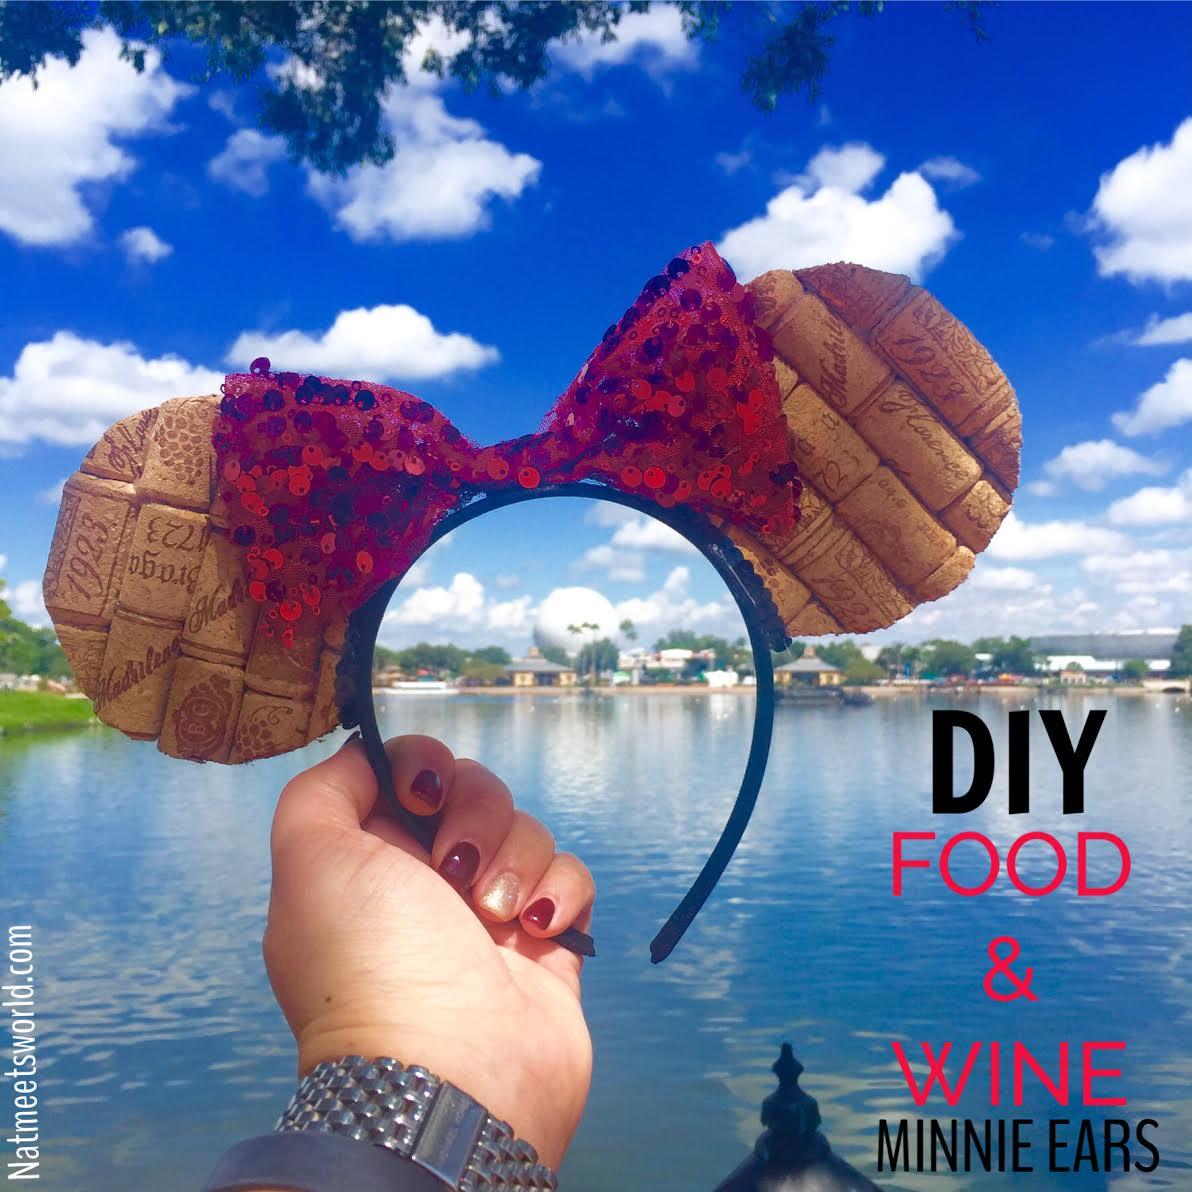 Diy Epcot Food Amp Wine Minnie Ears Nati Meets World